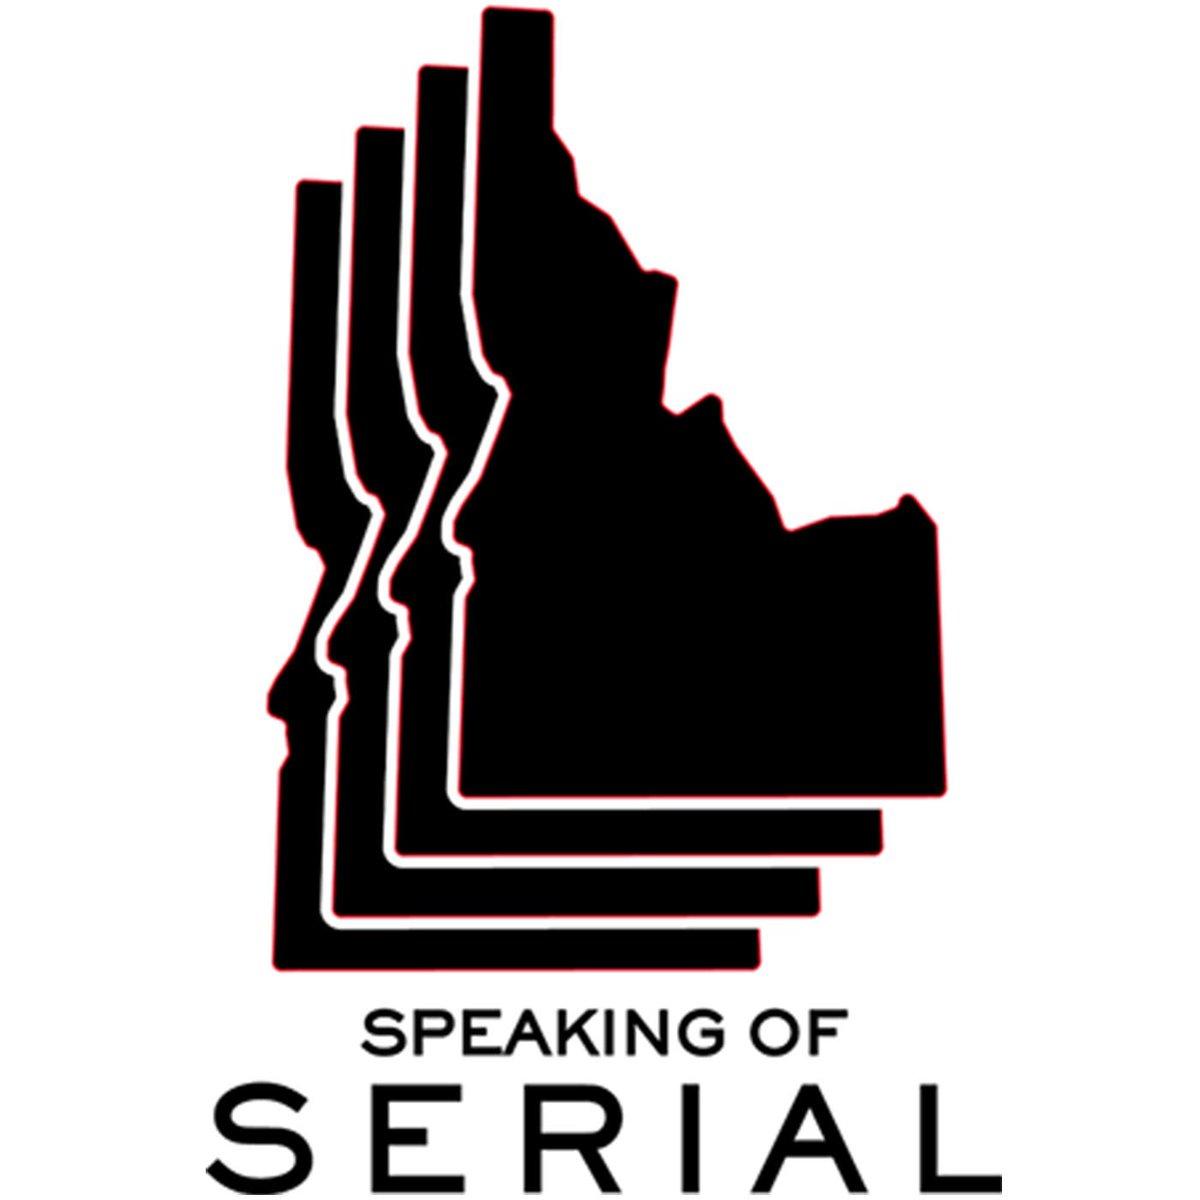 speakingofserial: Latest news, Breaking headlines and Top